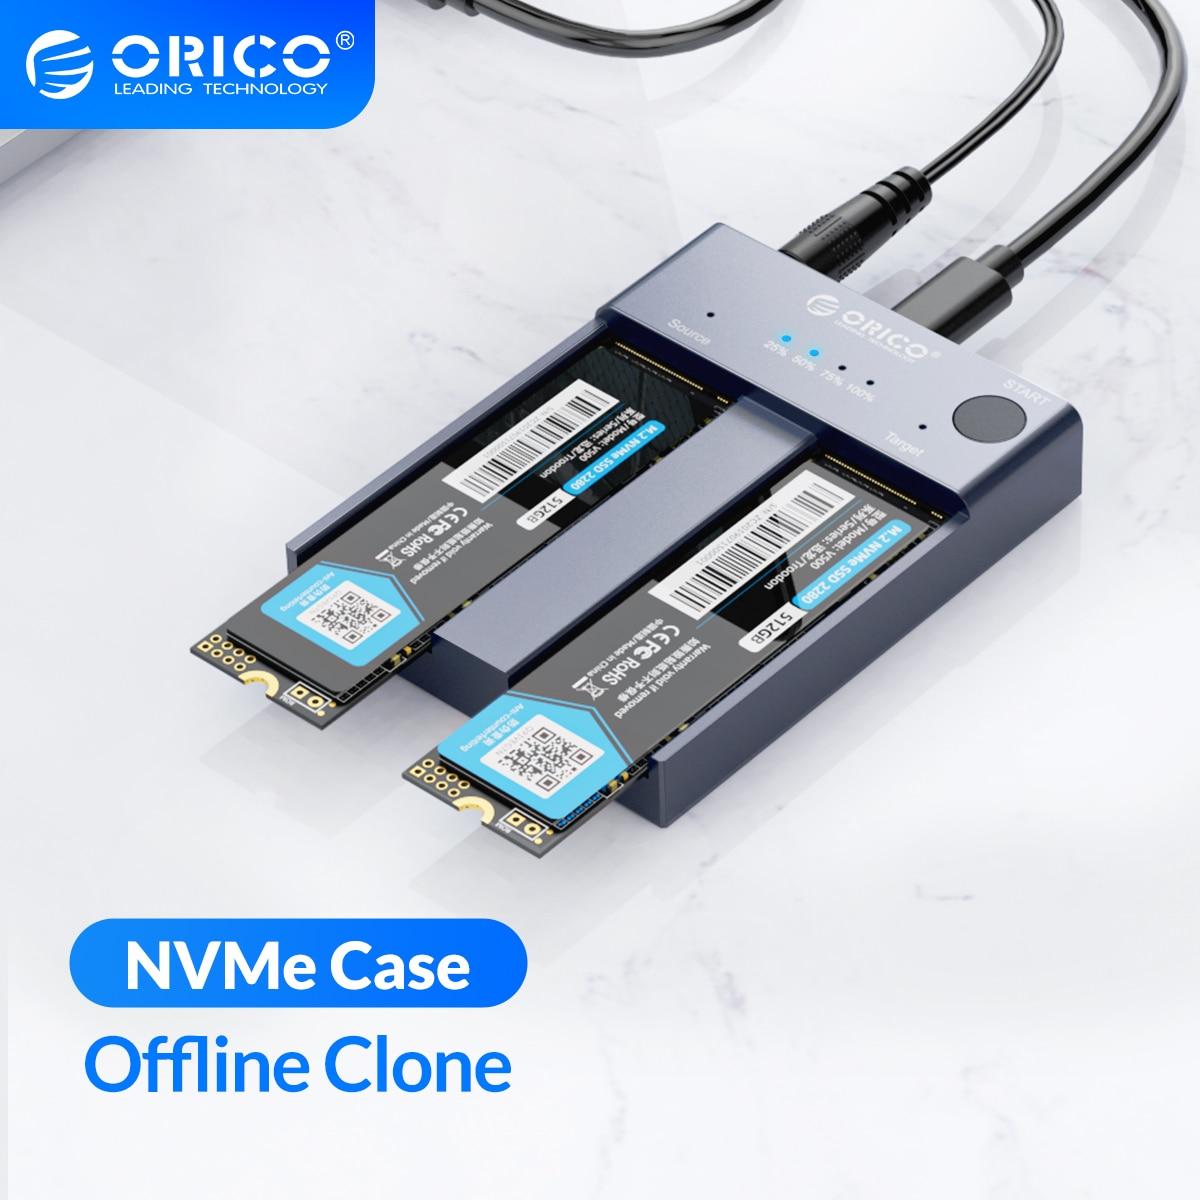 ORICO المزدوج خليج M.2 NVME SSD الضميمة حاليا استنساخ USB C 3.1 Gen2 10 جيجابايت مفتاح M & M/B مفتاح NVME بكيي وسيط تخزين ذو حالة ثابتة/ القرص الصلب قارئ